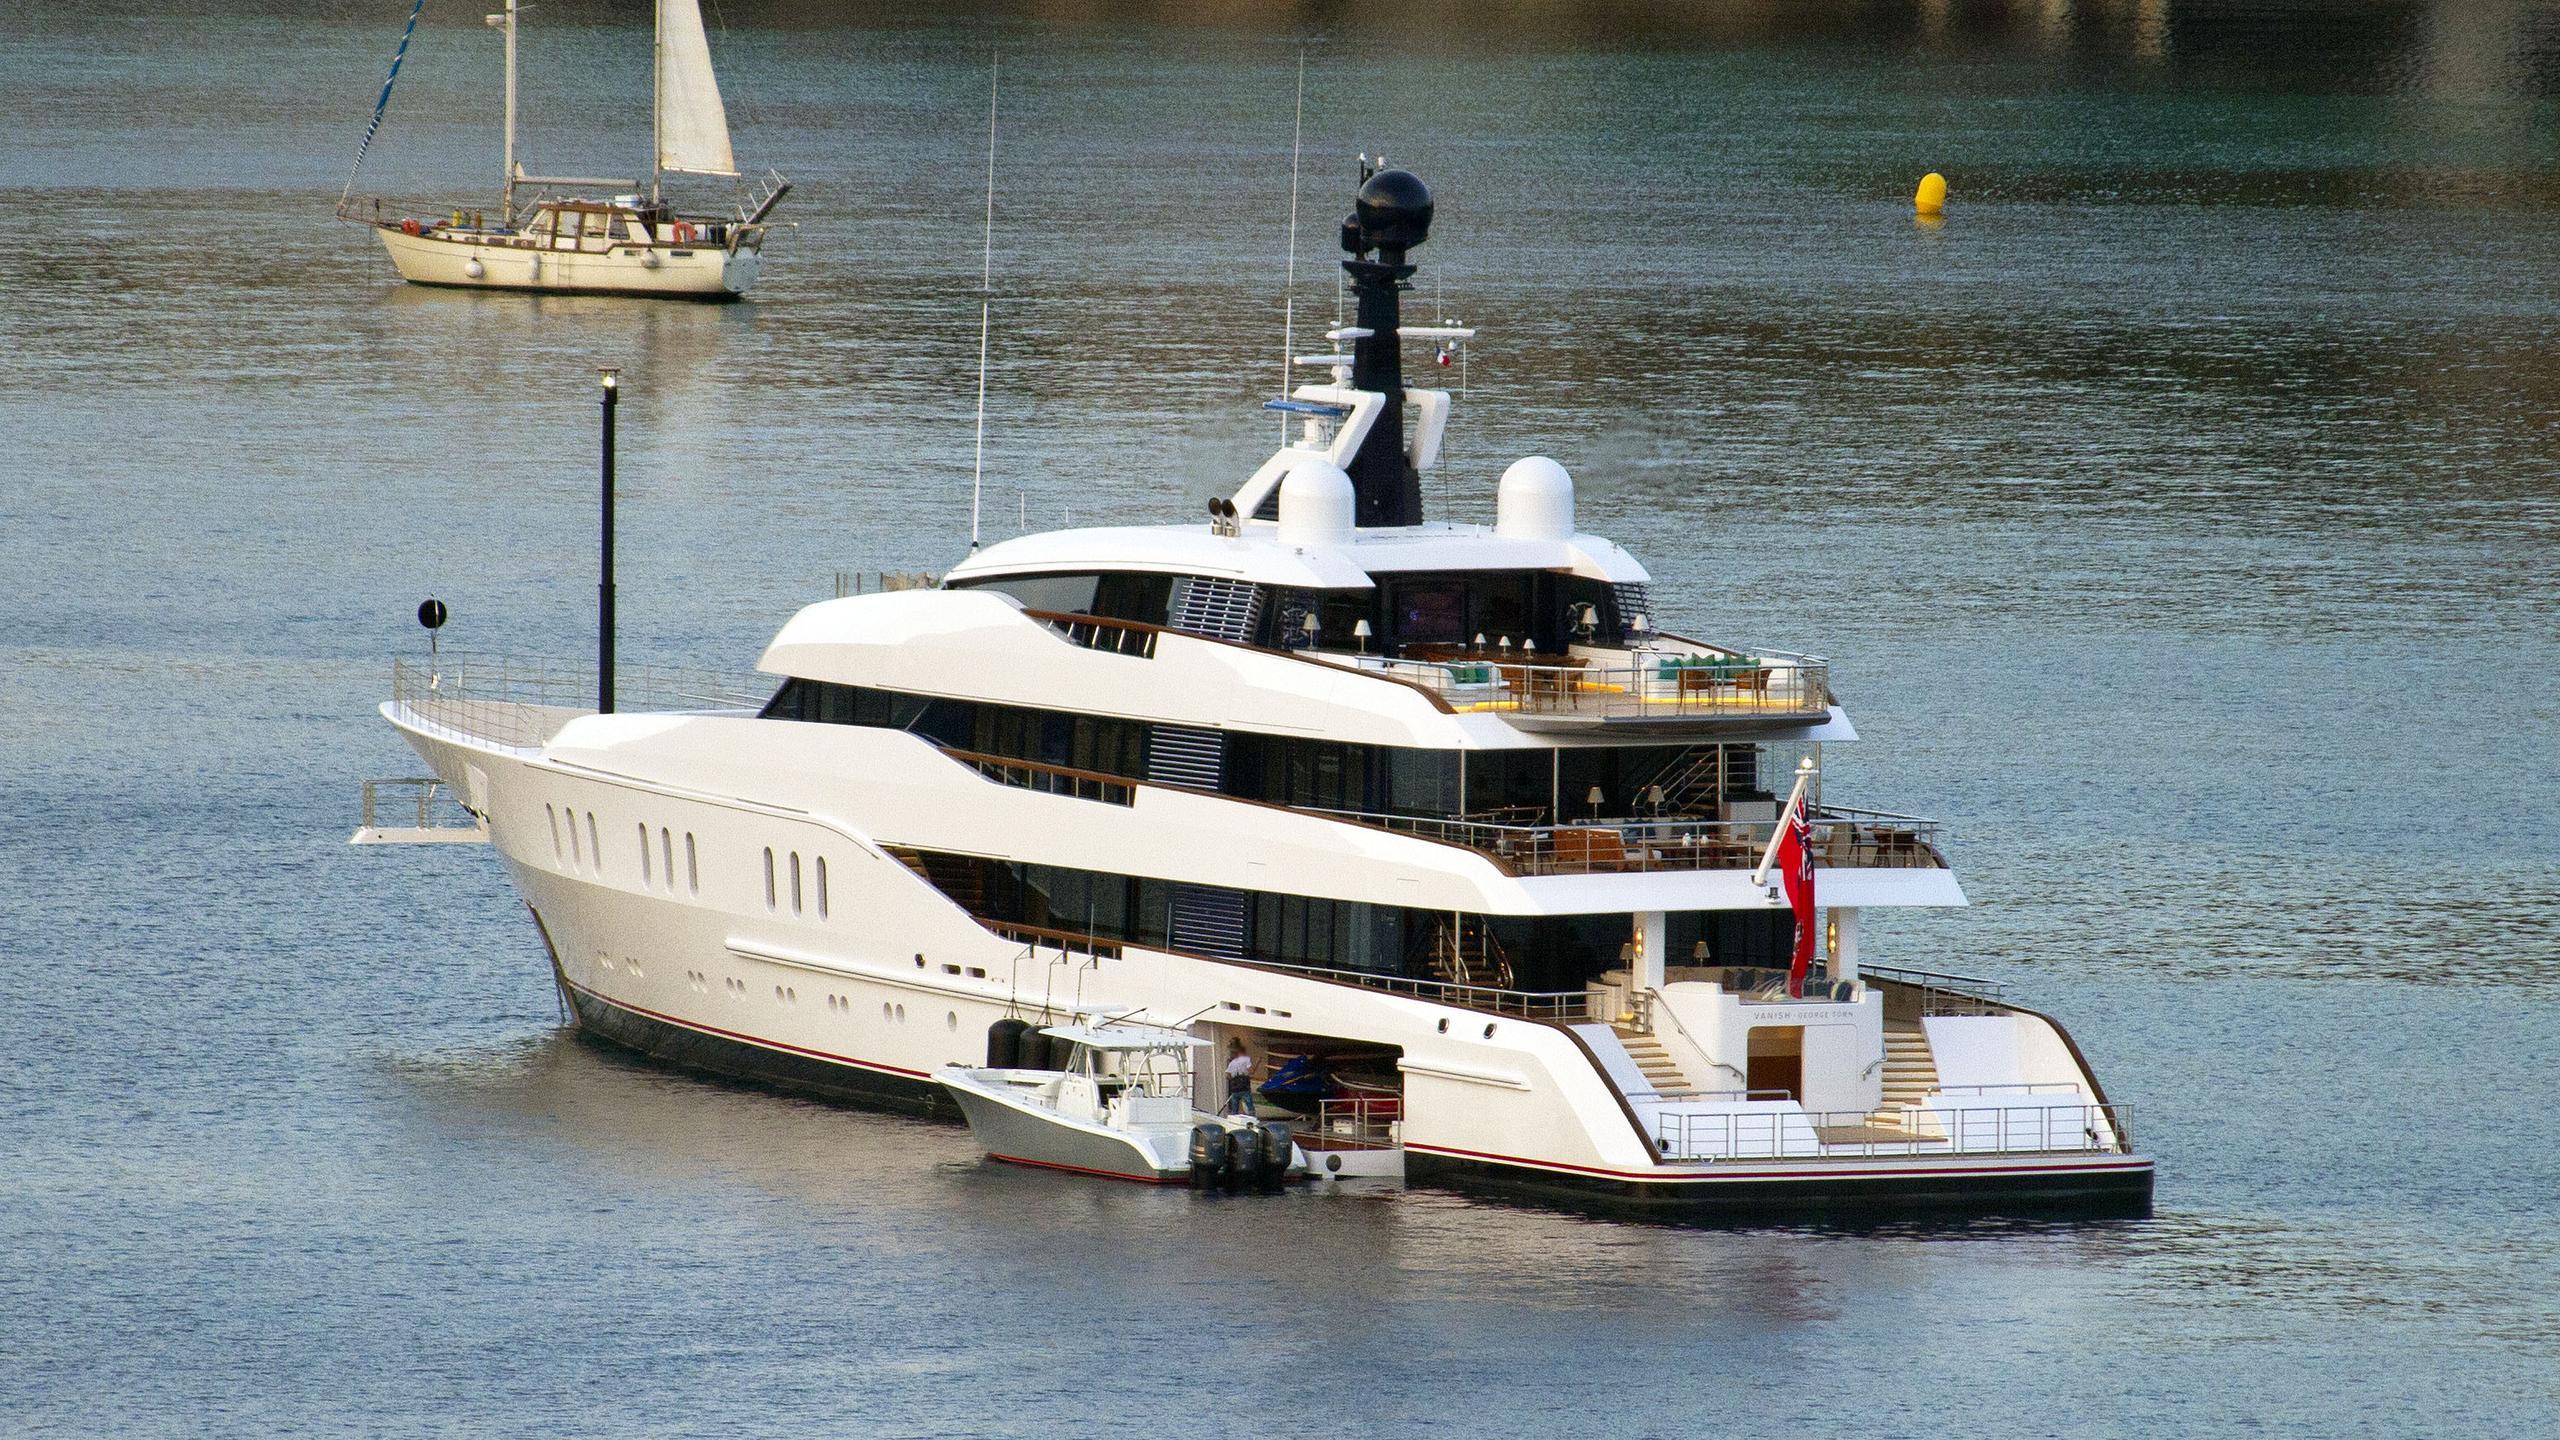 vanish-motor-yacht-feadship-2016-66m-half-stern